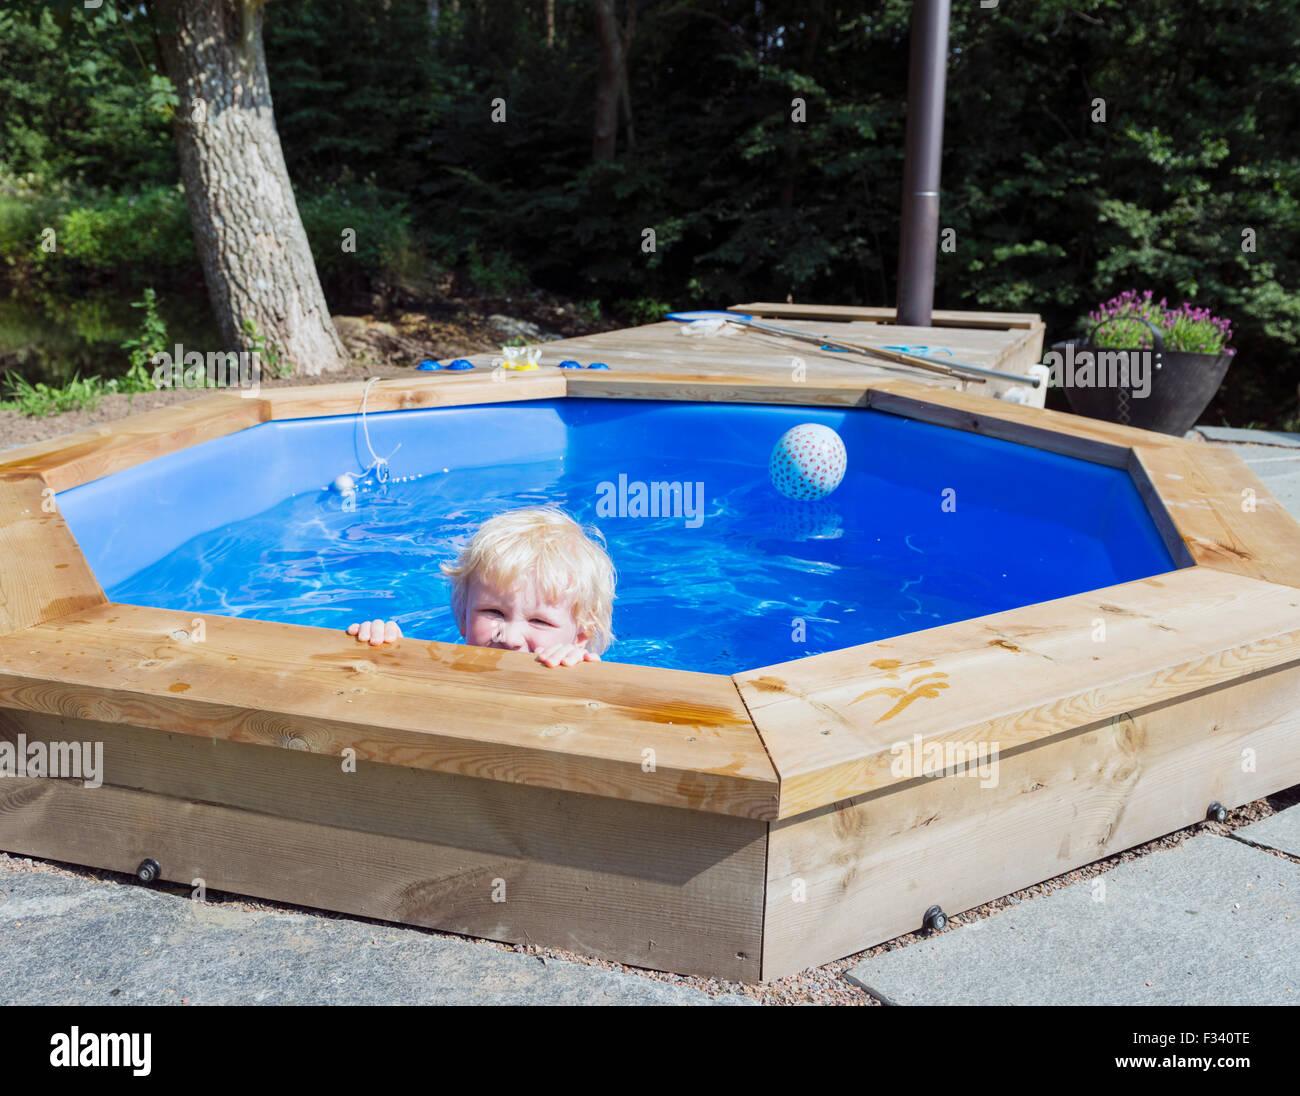 Hot Bath Tub Stock Photos & Hot Bath Tub Stock Images - Alamy